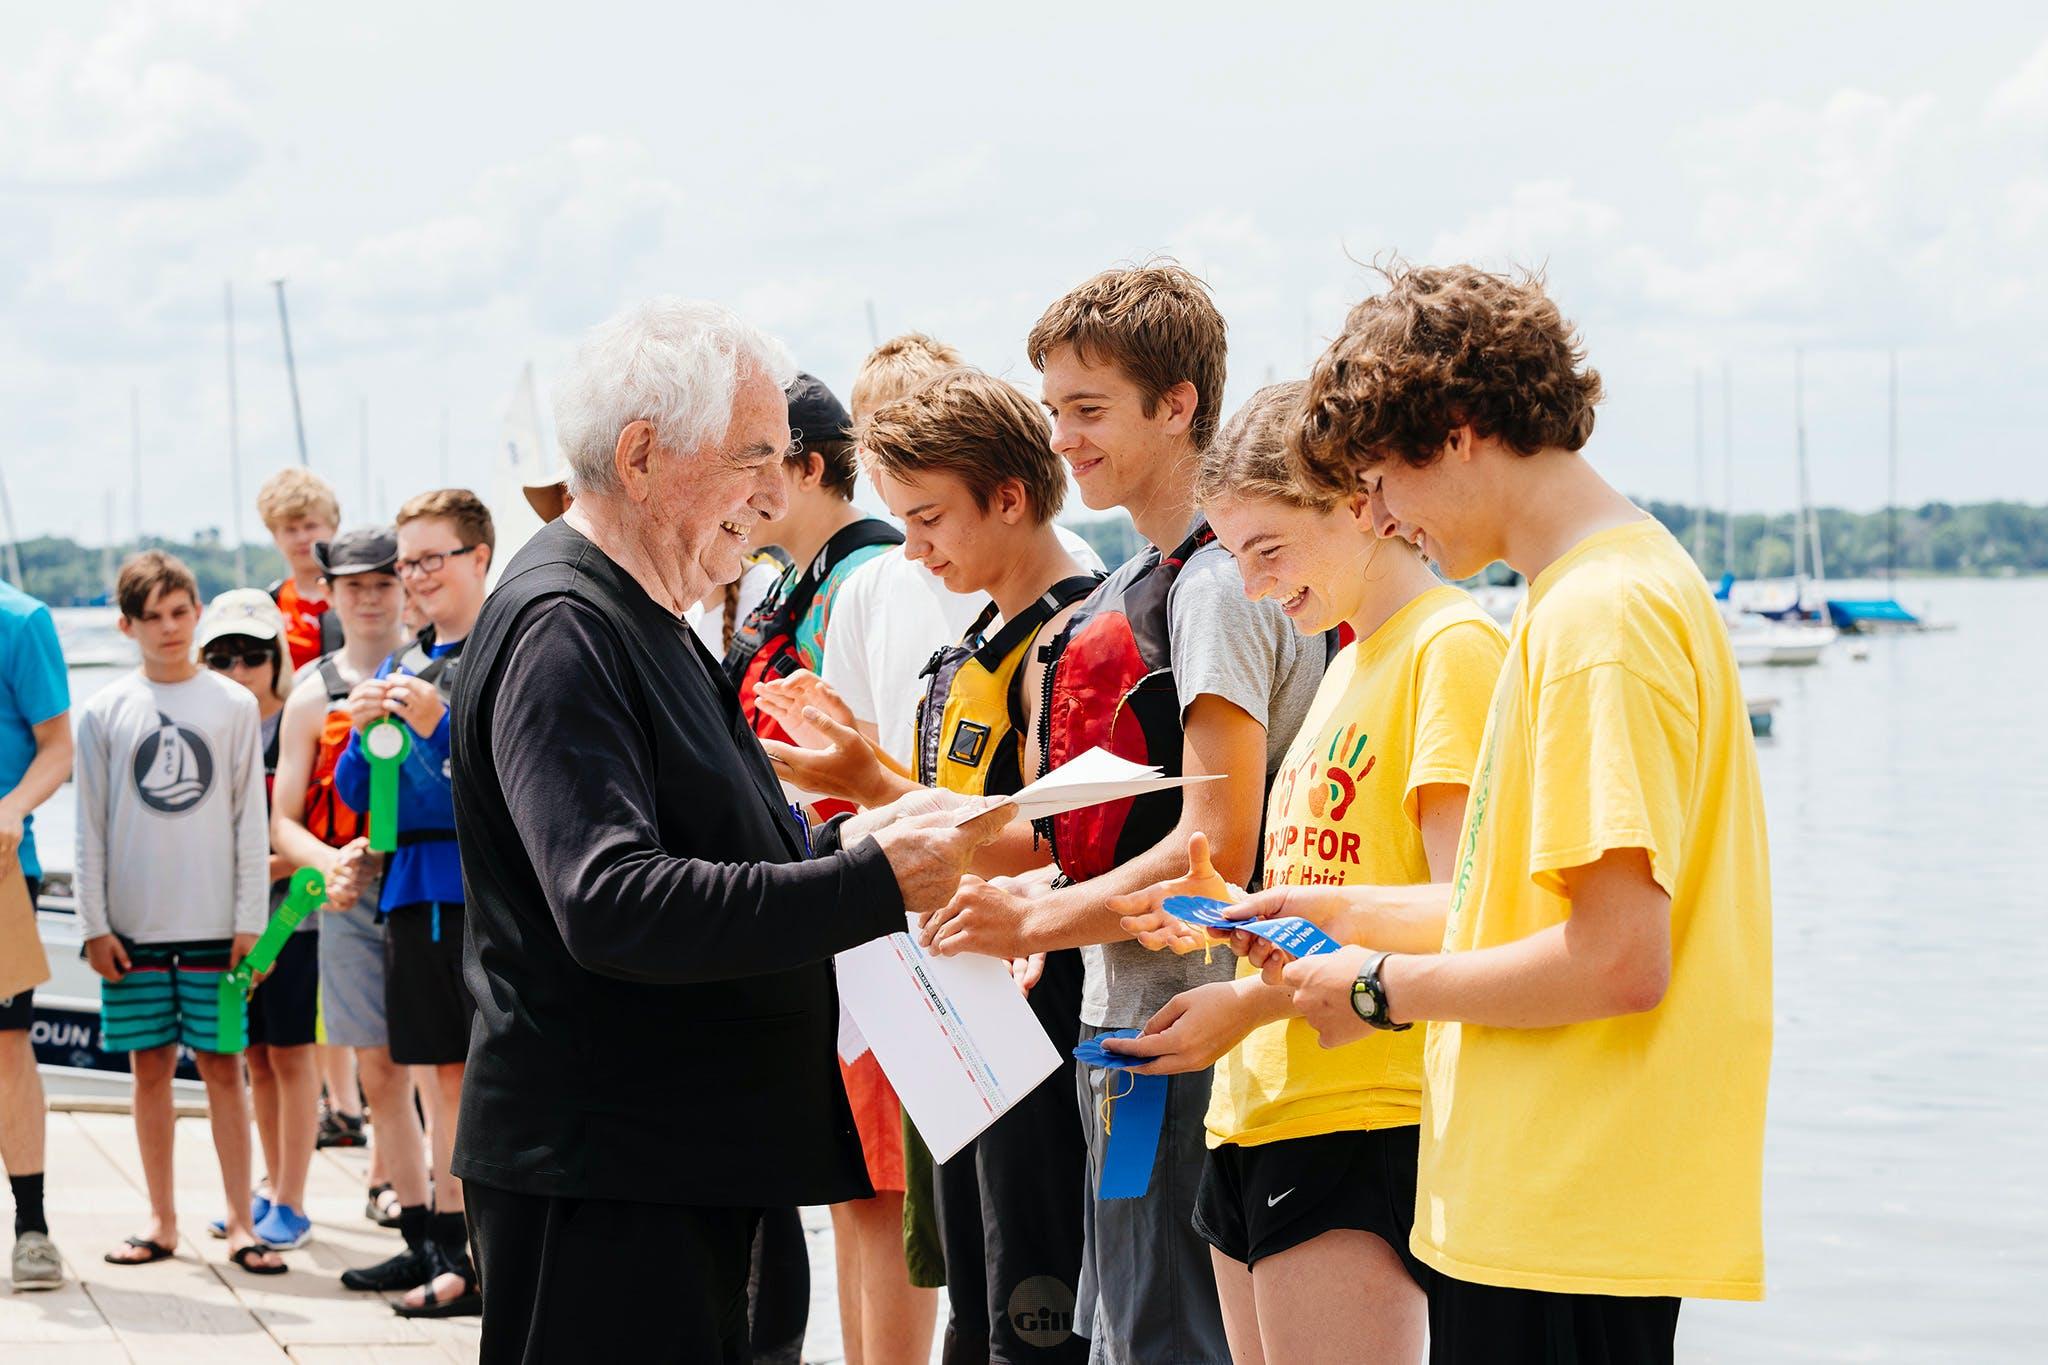 Artist Daniel Buren handing out ribbons to boat race participants.